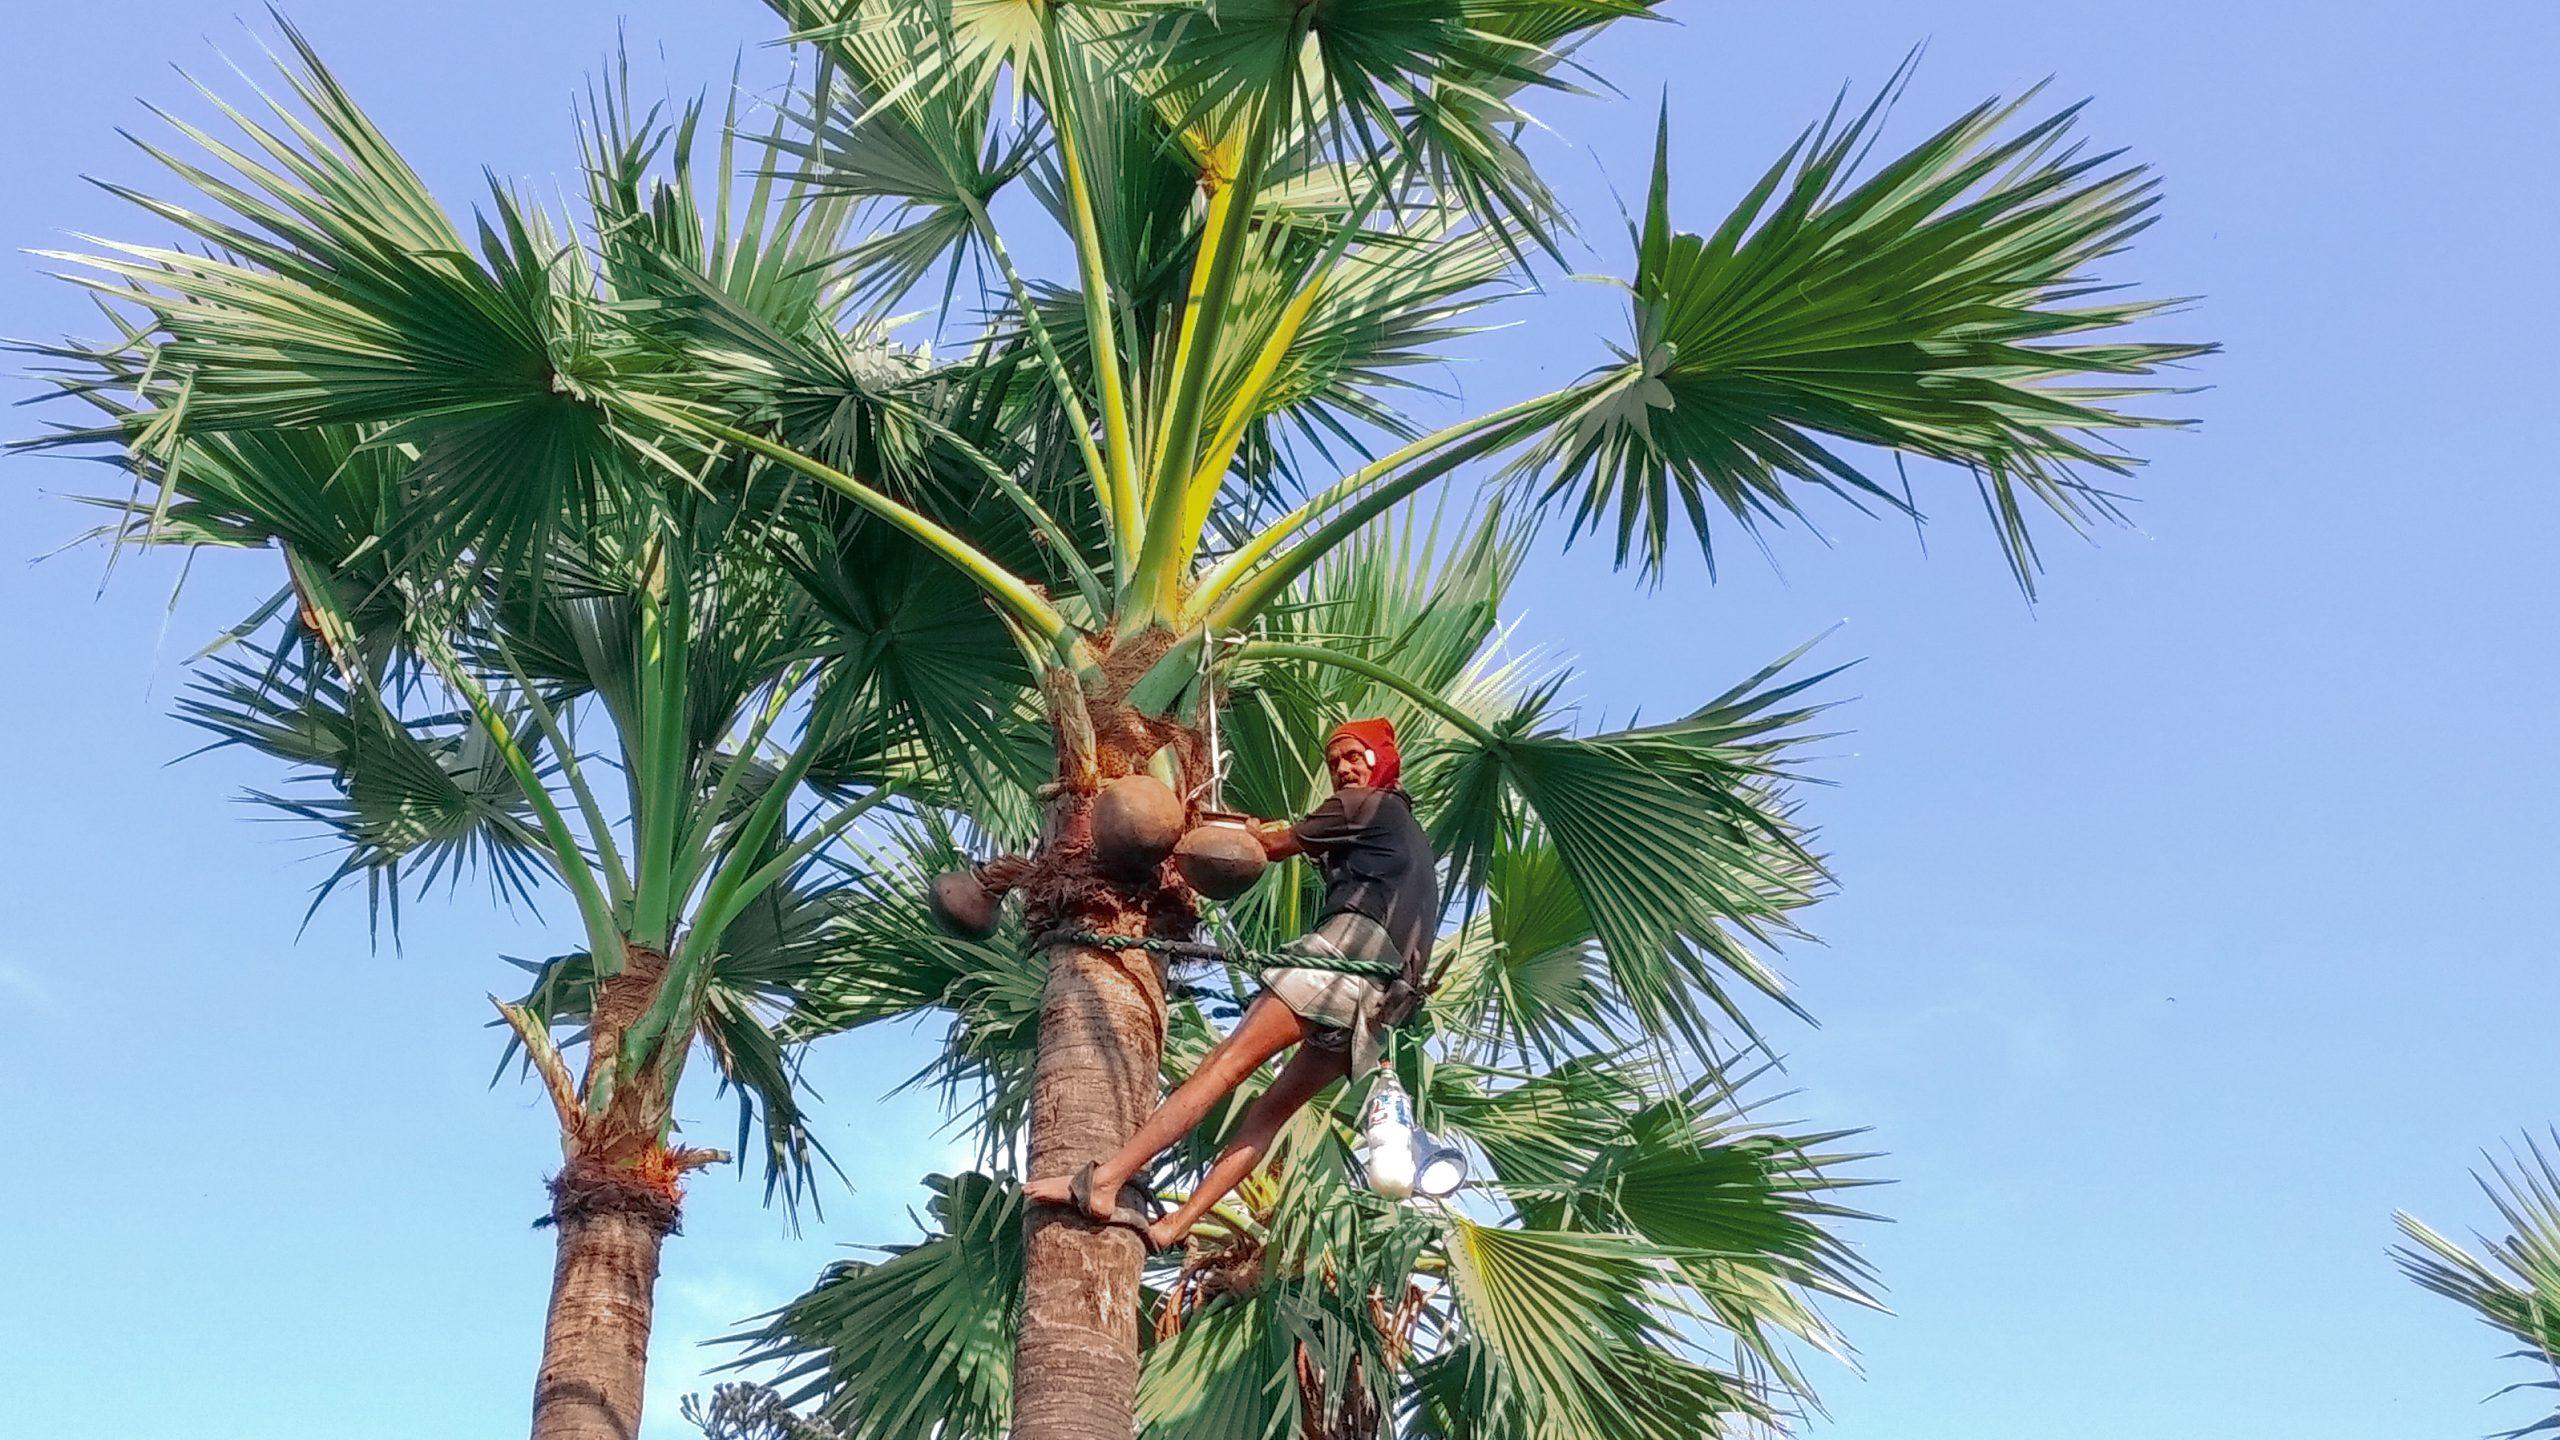 A man on coconut tree